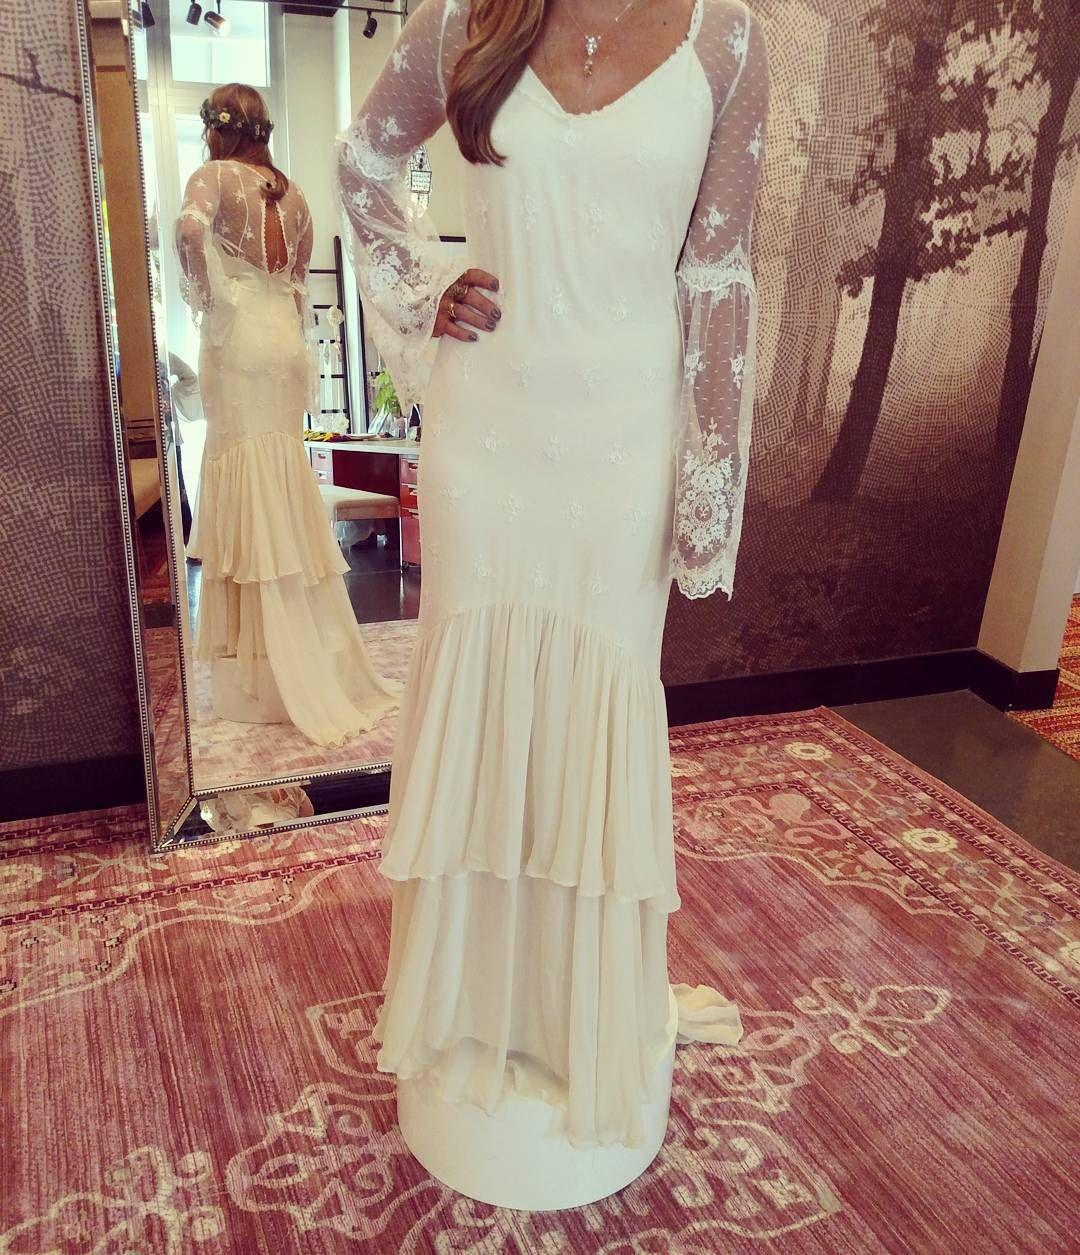 Chantel Lauren Boho Wedding Dress | Asheville NC Bridal Shop | Instagram  Photo By @wildflowerbridal